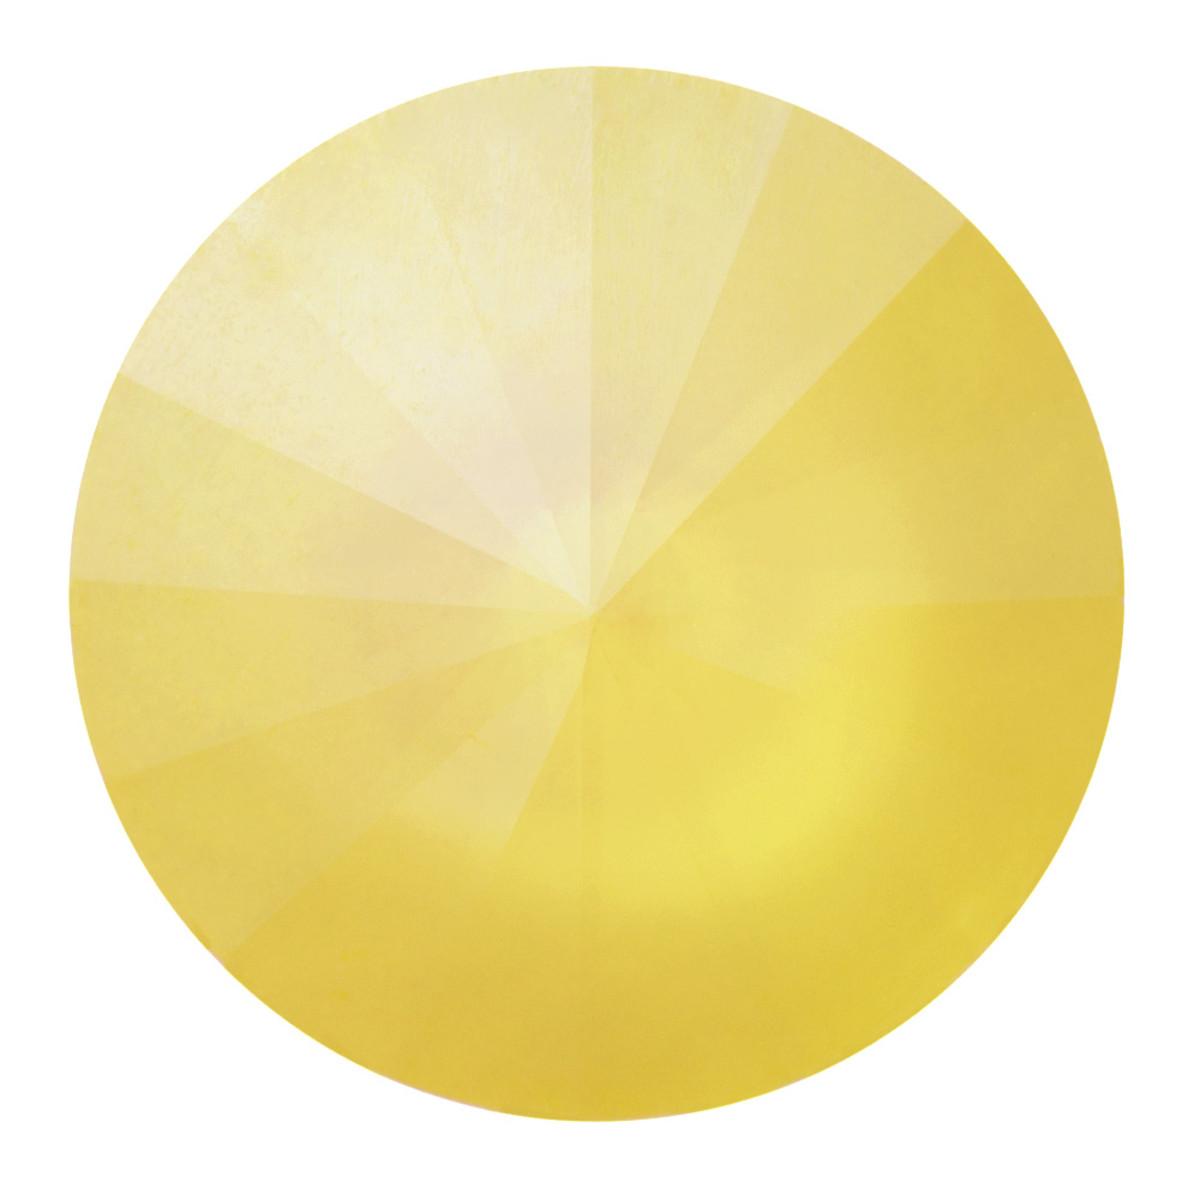 Swarovski Elements Rivolis 14mm Crystal Buttercup 1 Stück